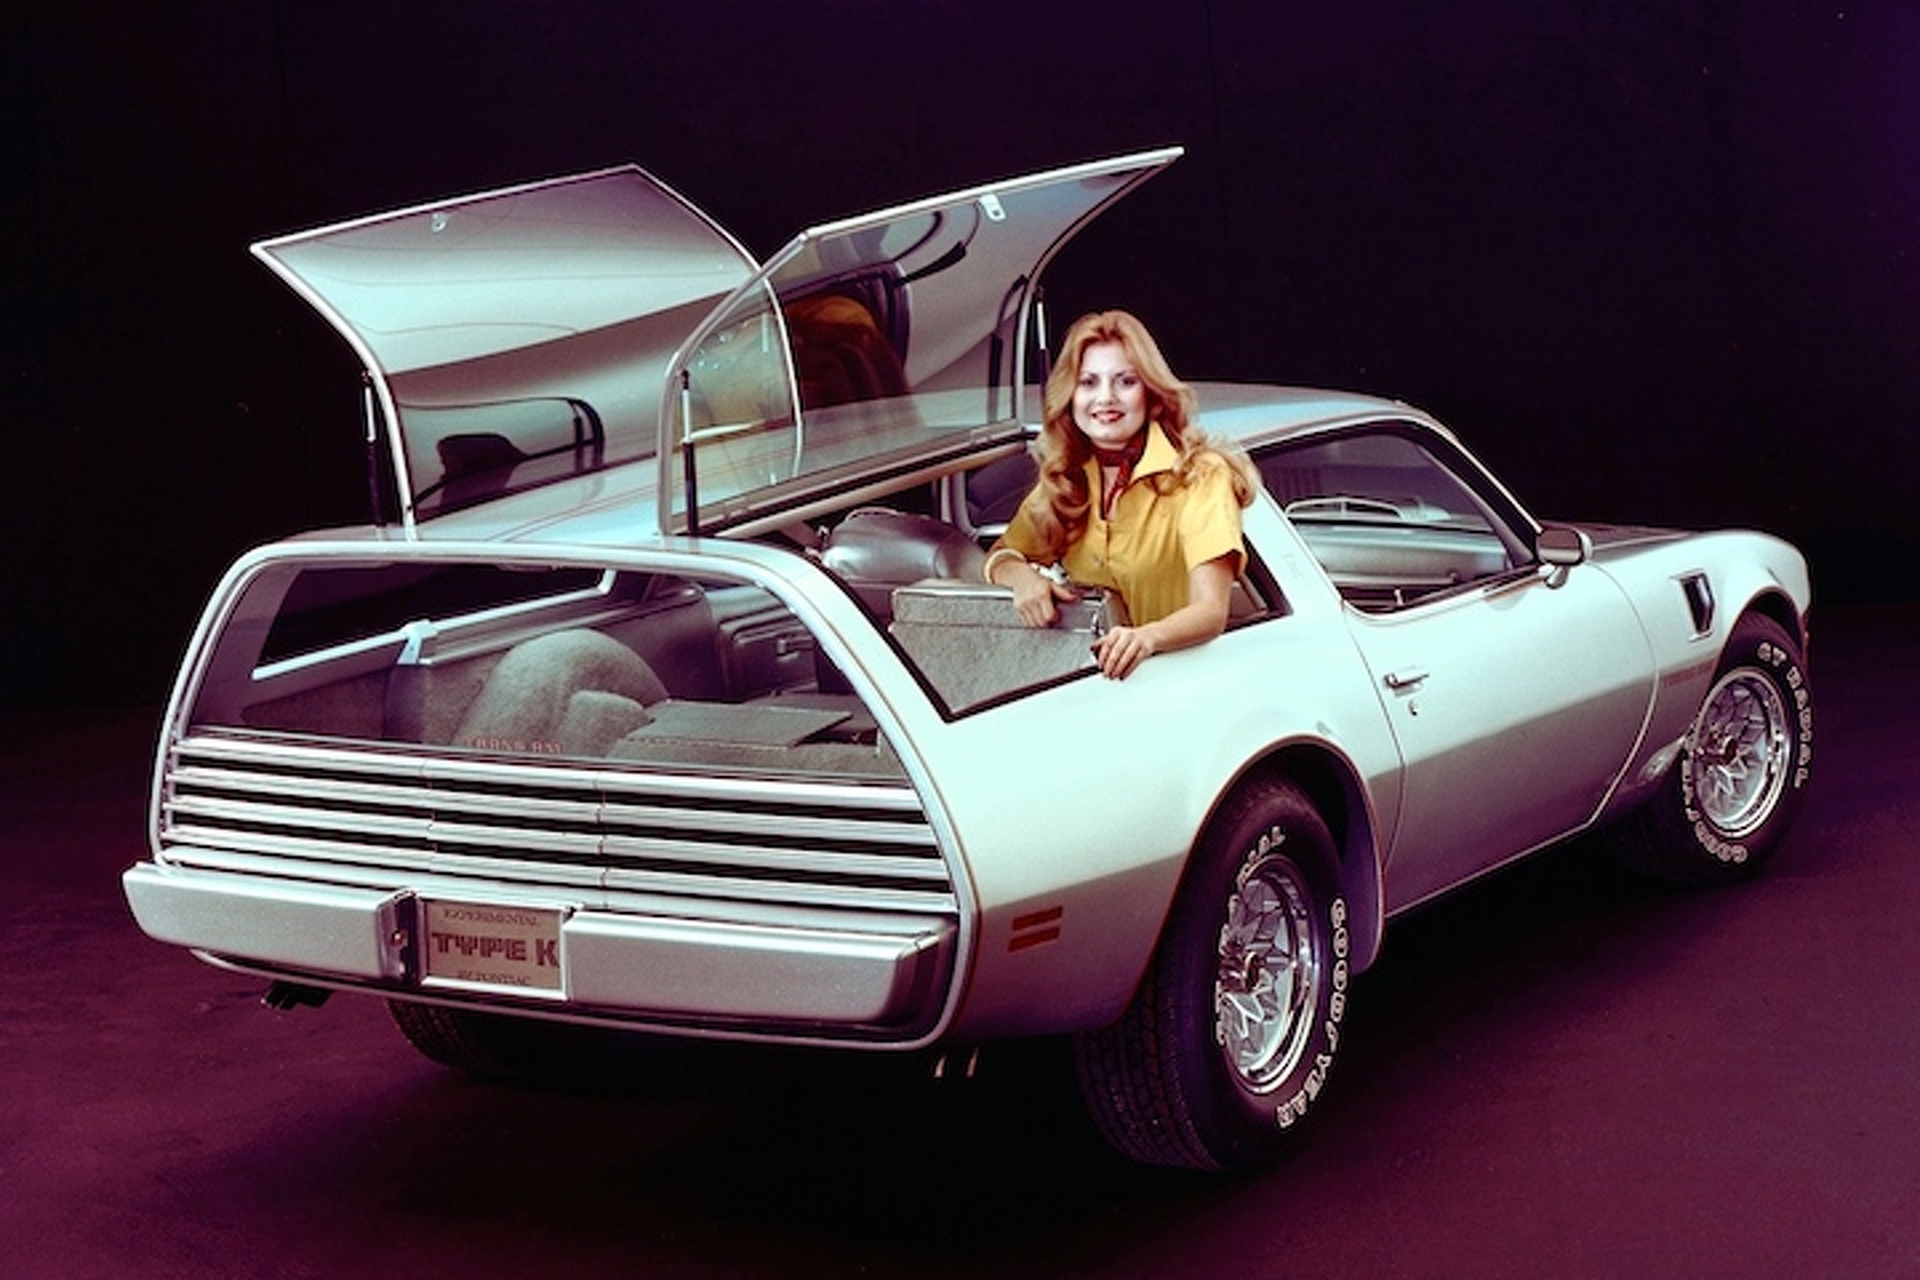 The Pontiac Kammback: Innovation vs. Convention